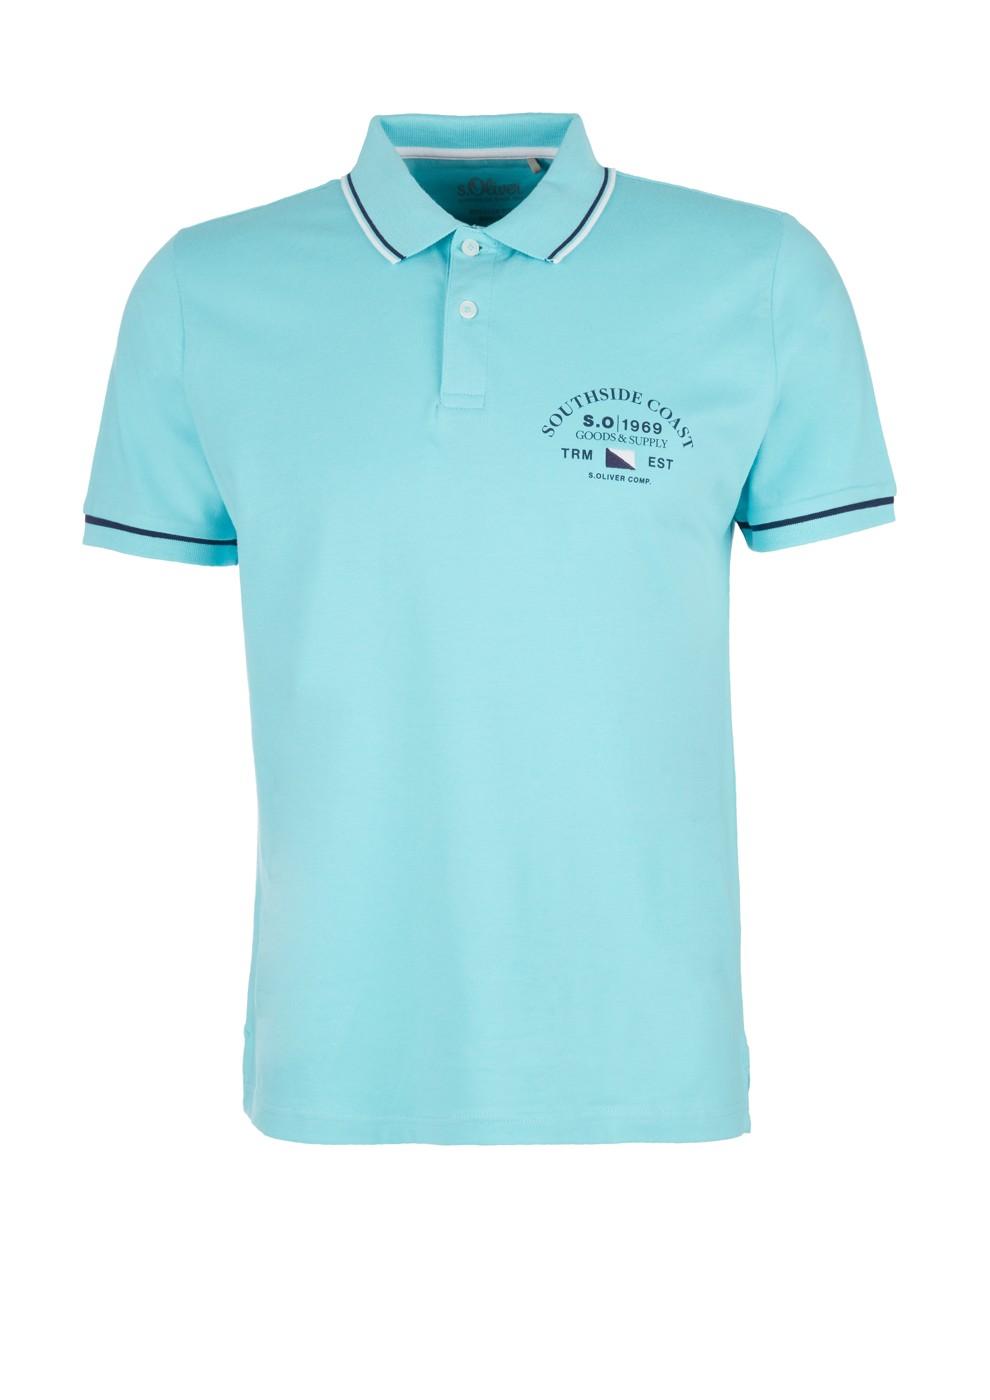 130 T-Shirt kurzarm - Herren